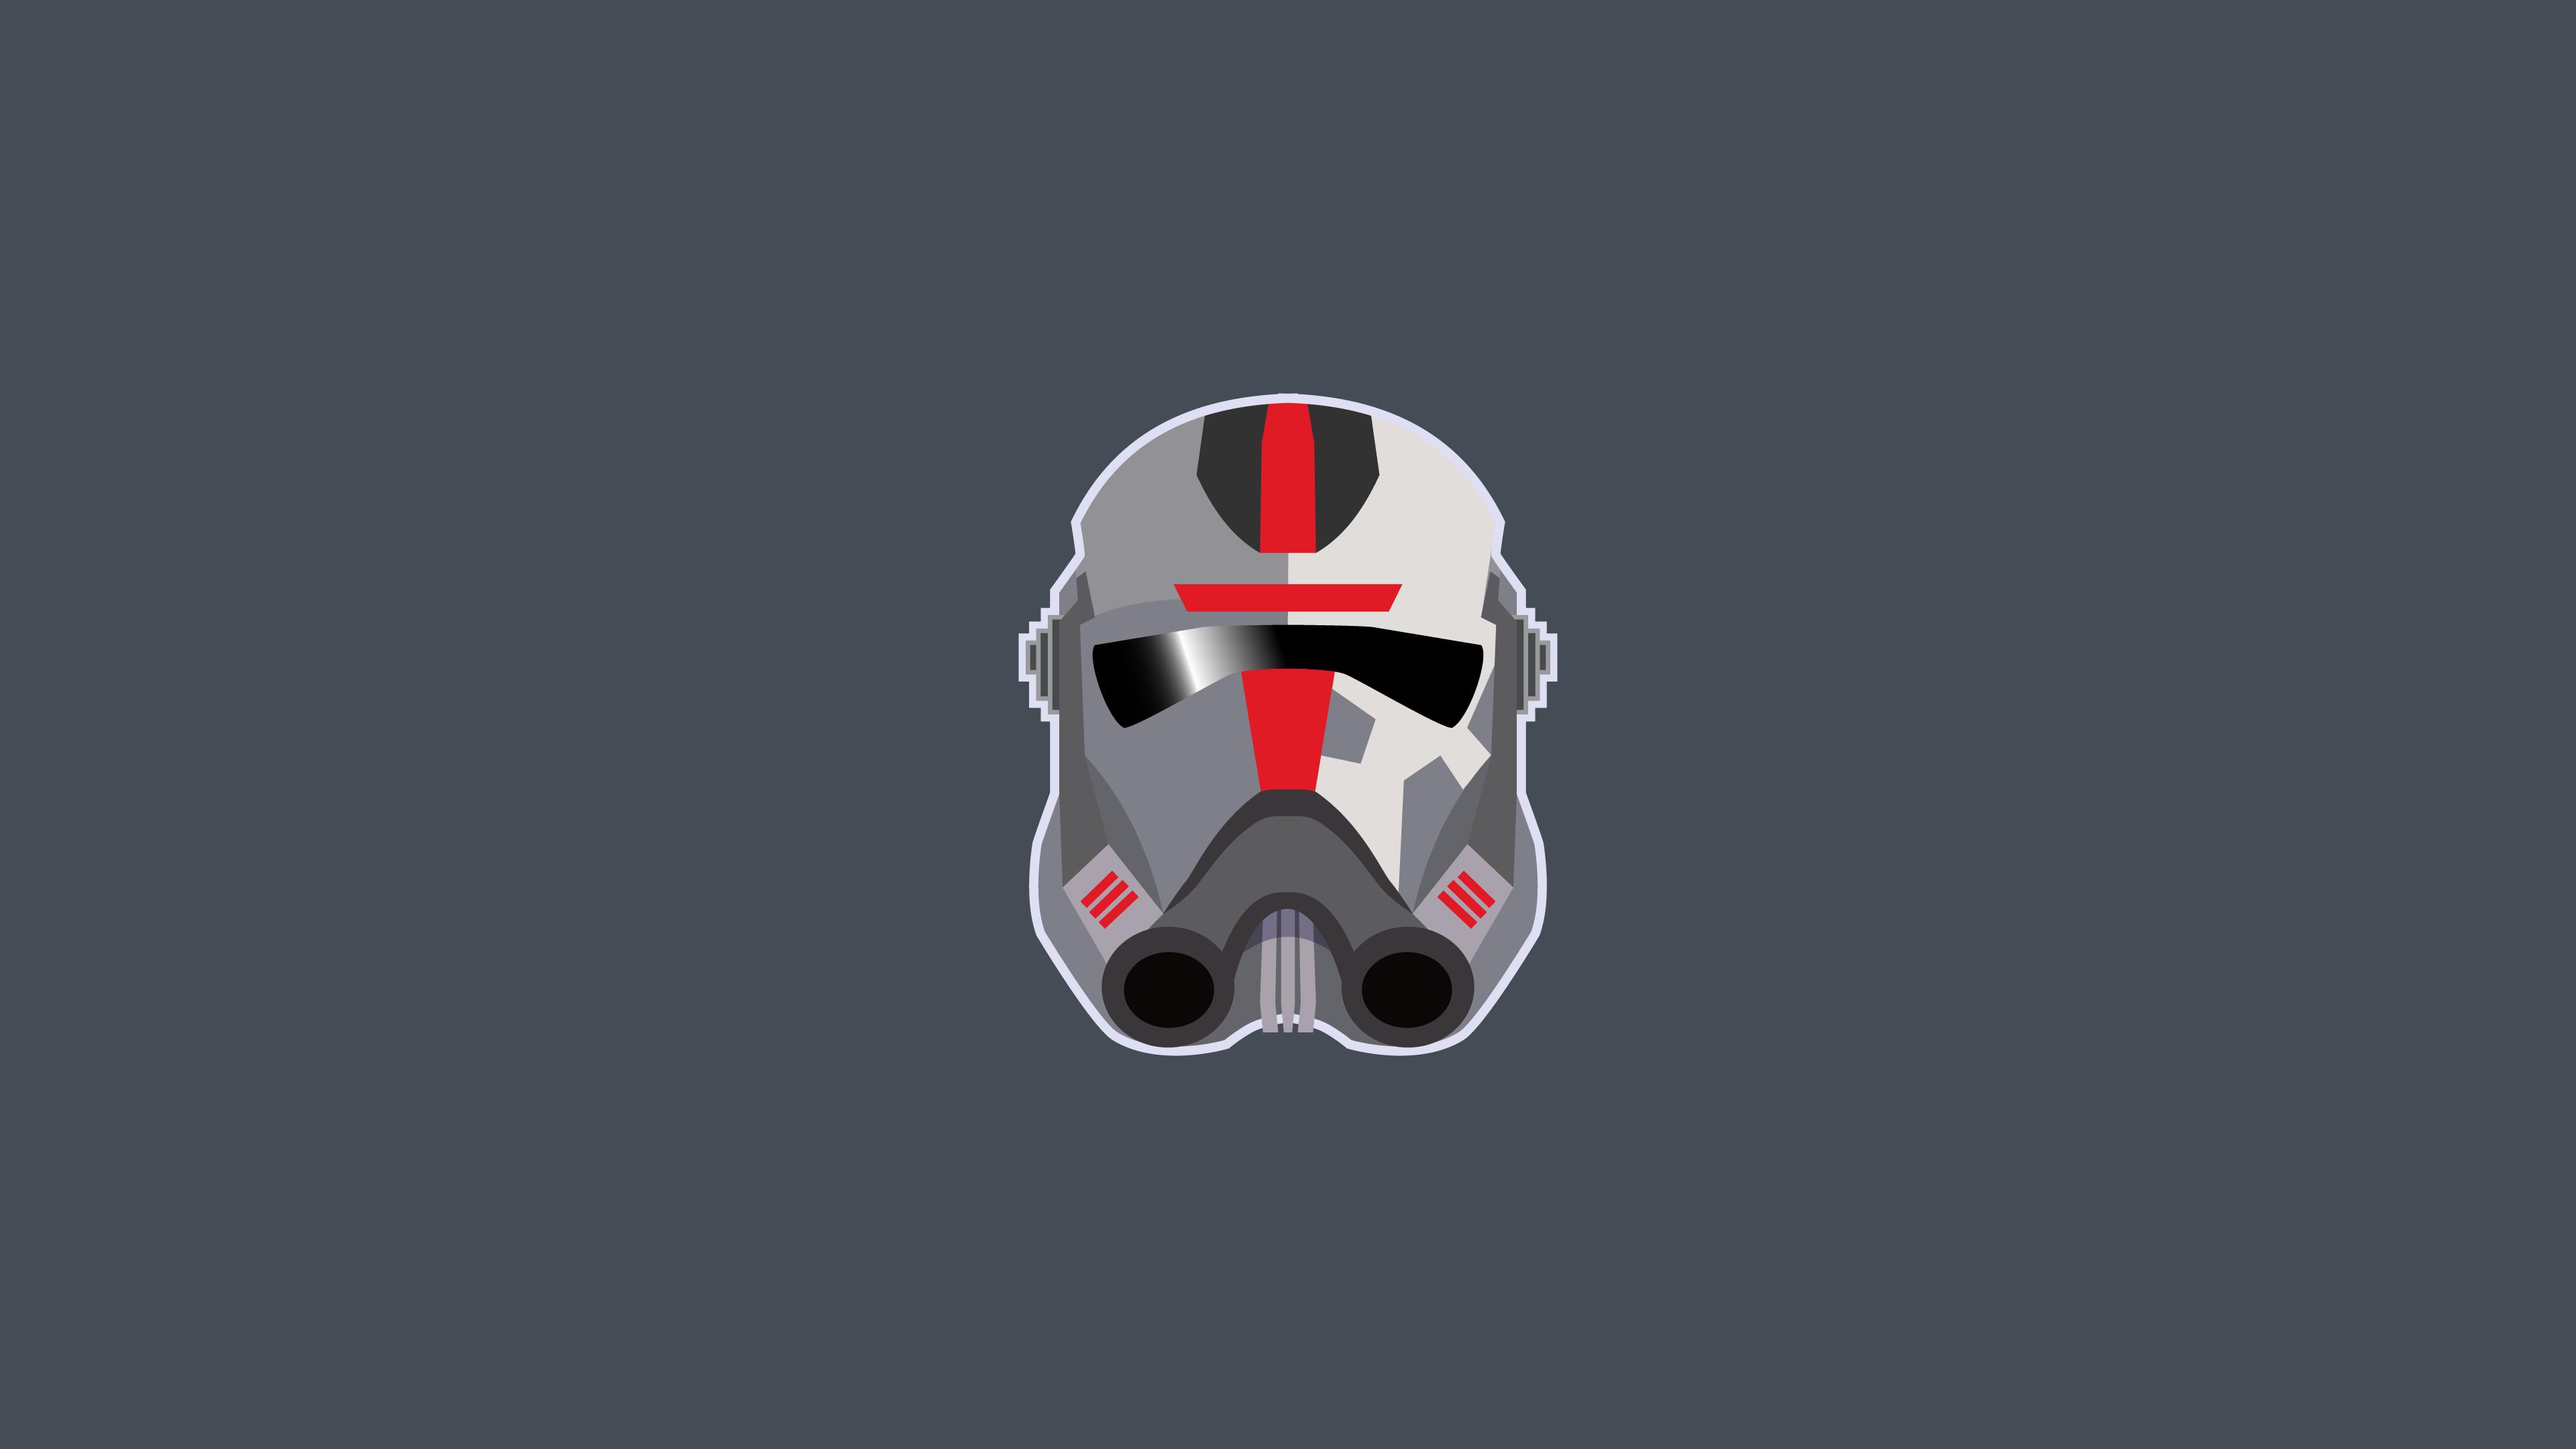 Star Wars Bad Batch Star Wars Bad Batch Helmet Clone Trooper TV Series Minimalism Gray Background 3840x2160